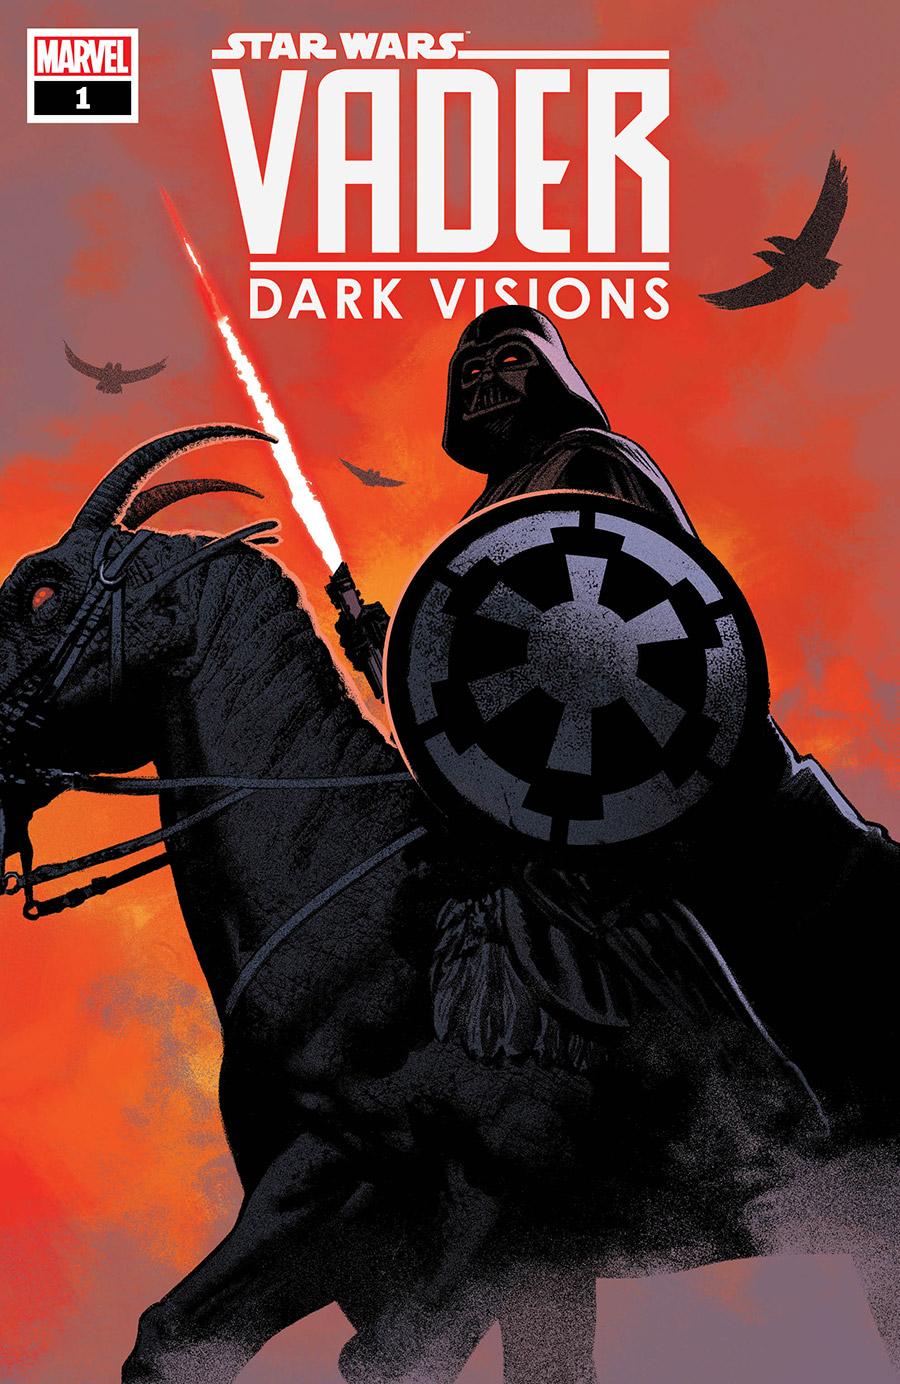 vader-dark-visions-cover-1.jpg